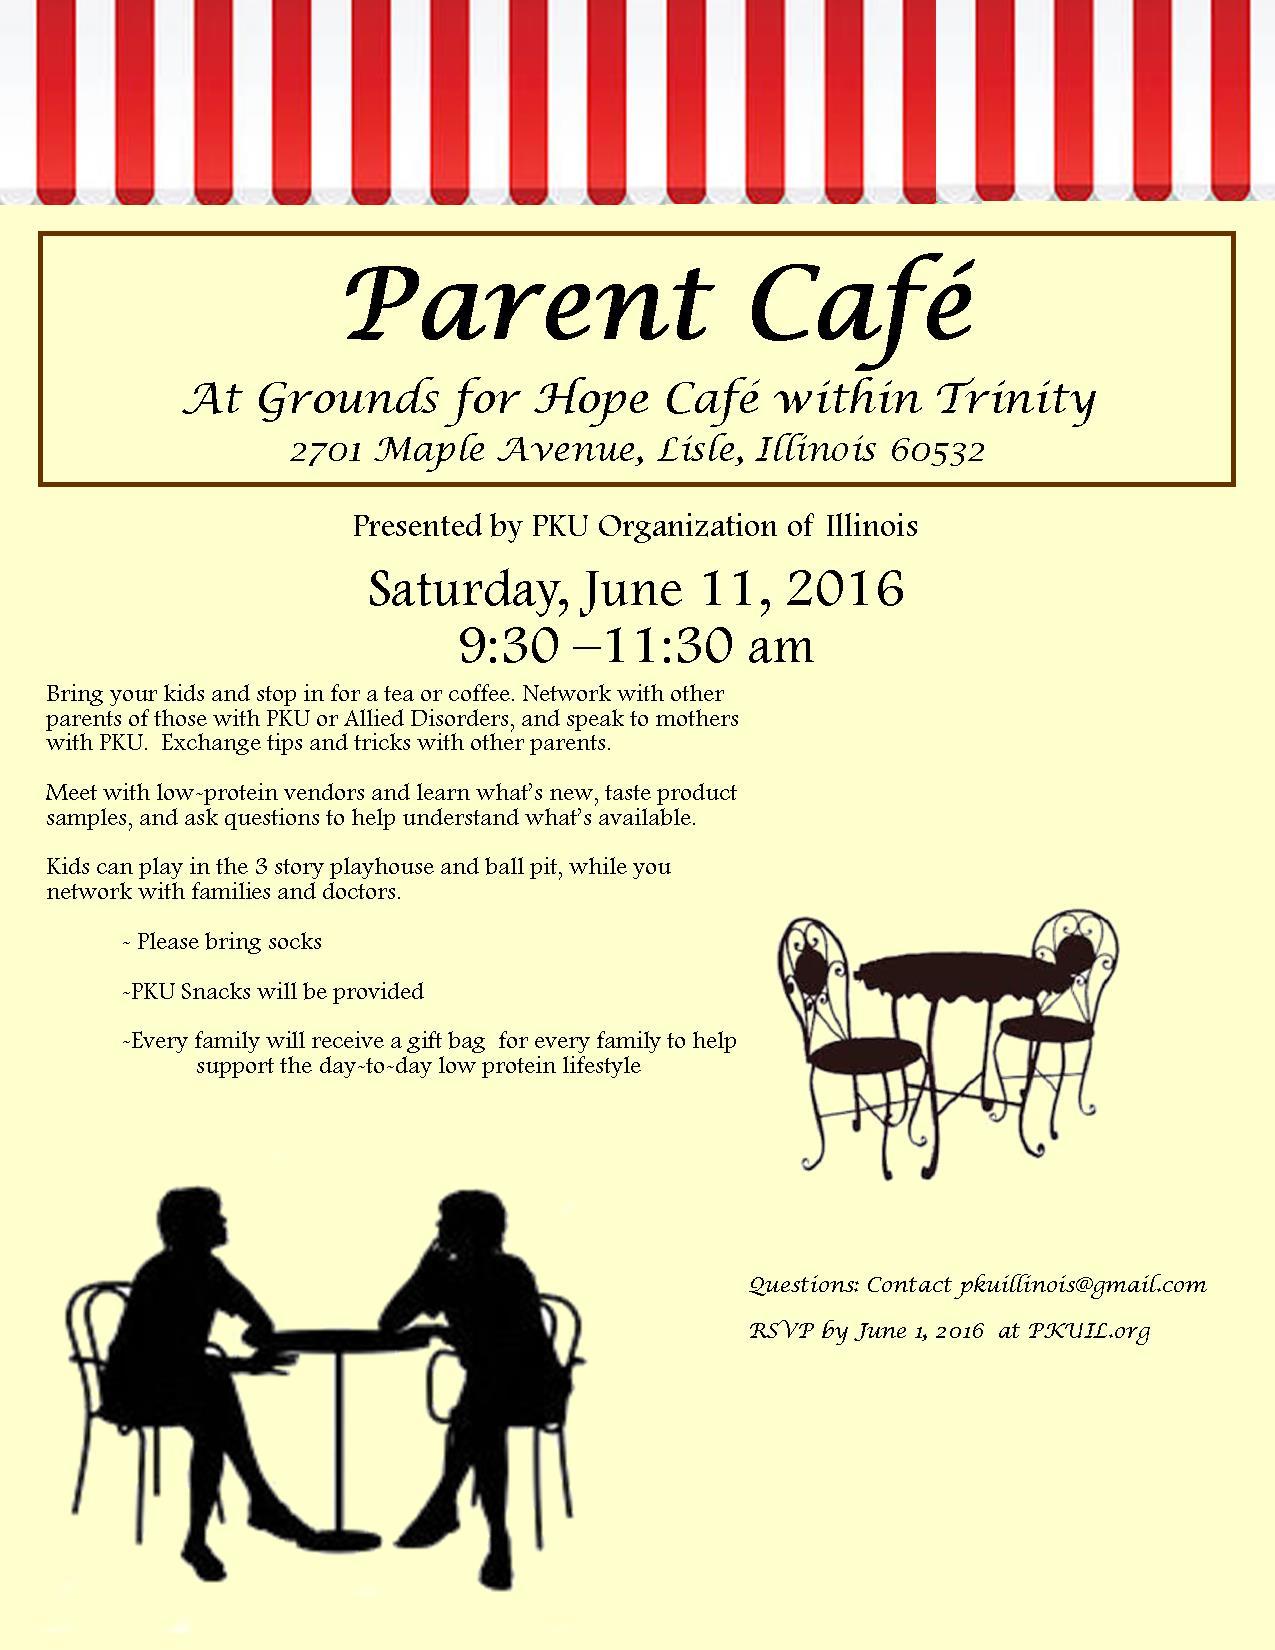 Parent Cafe 2016